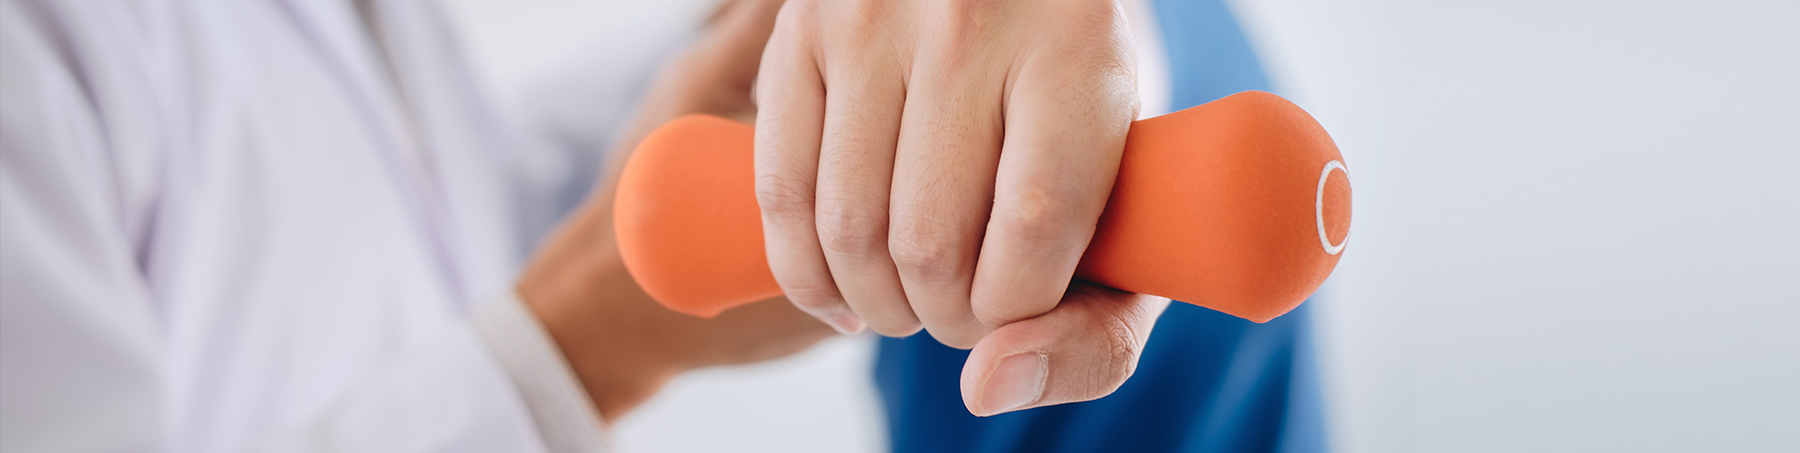 personal-injury-accident-rehabilitation